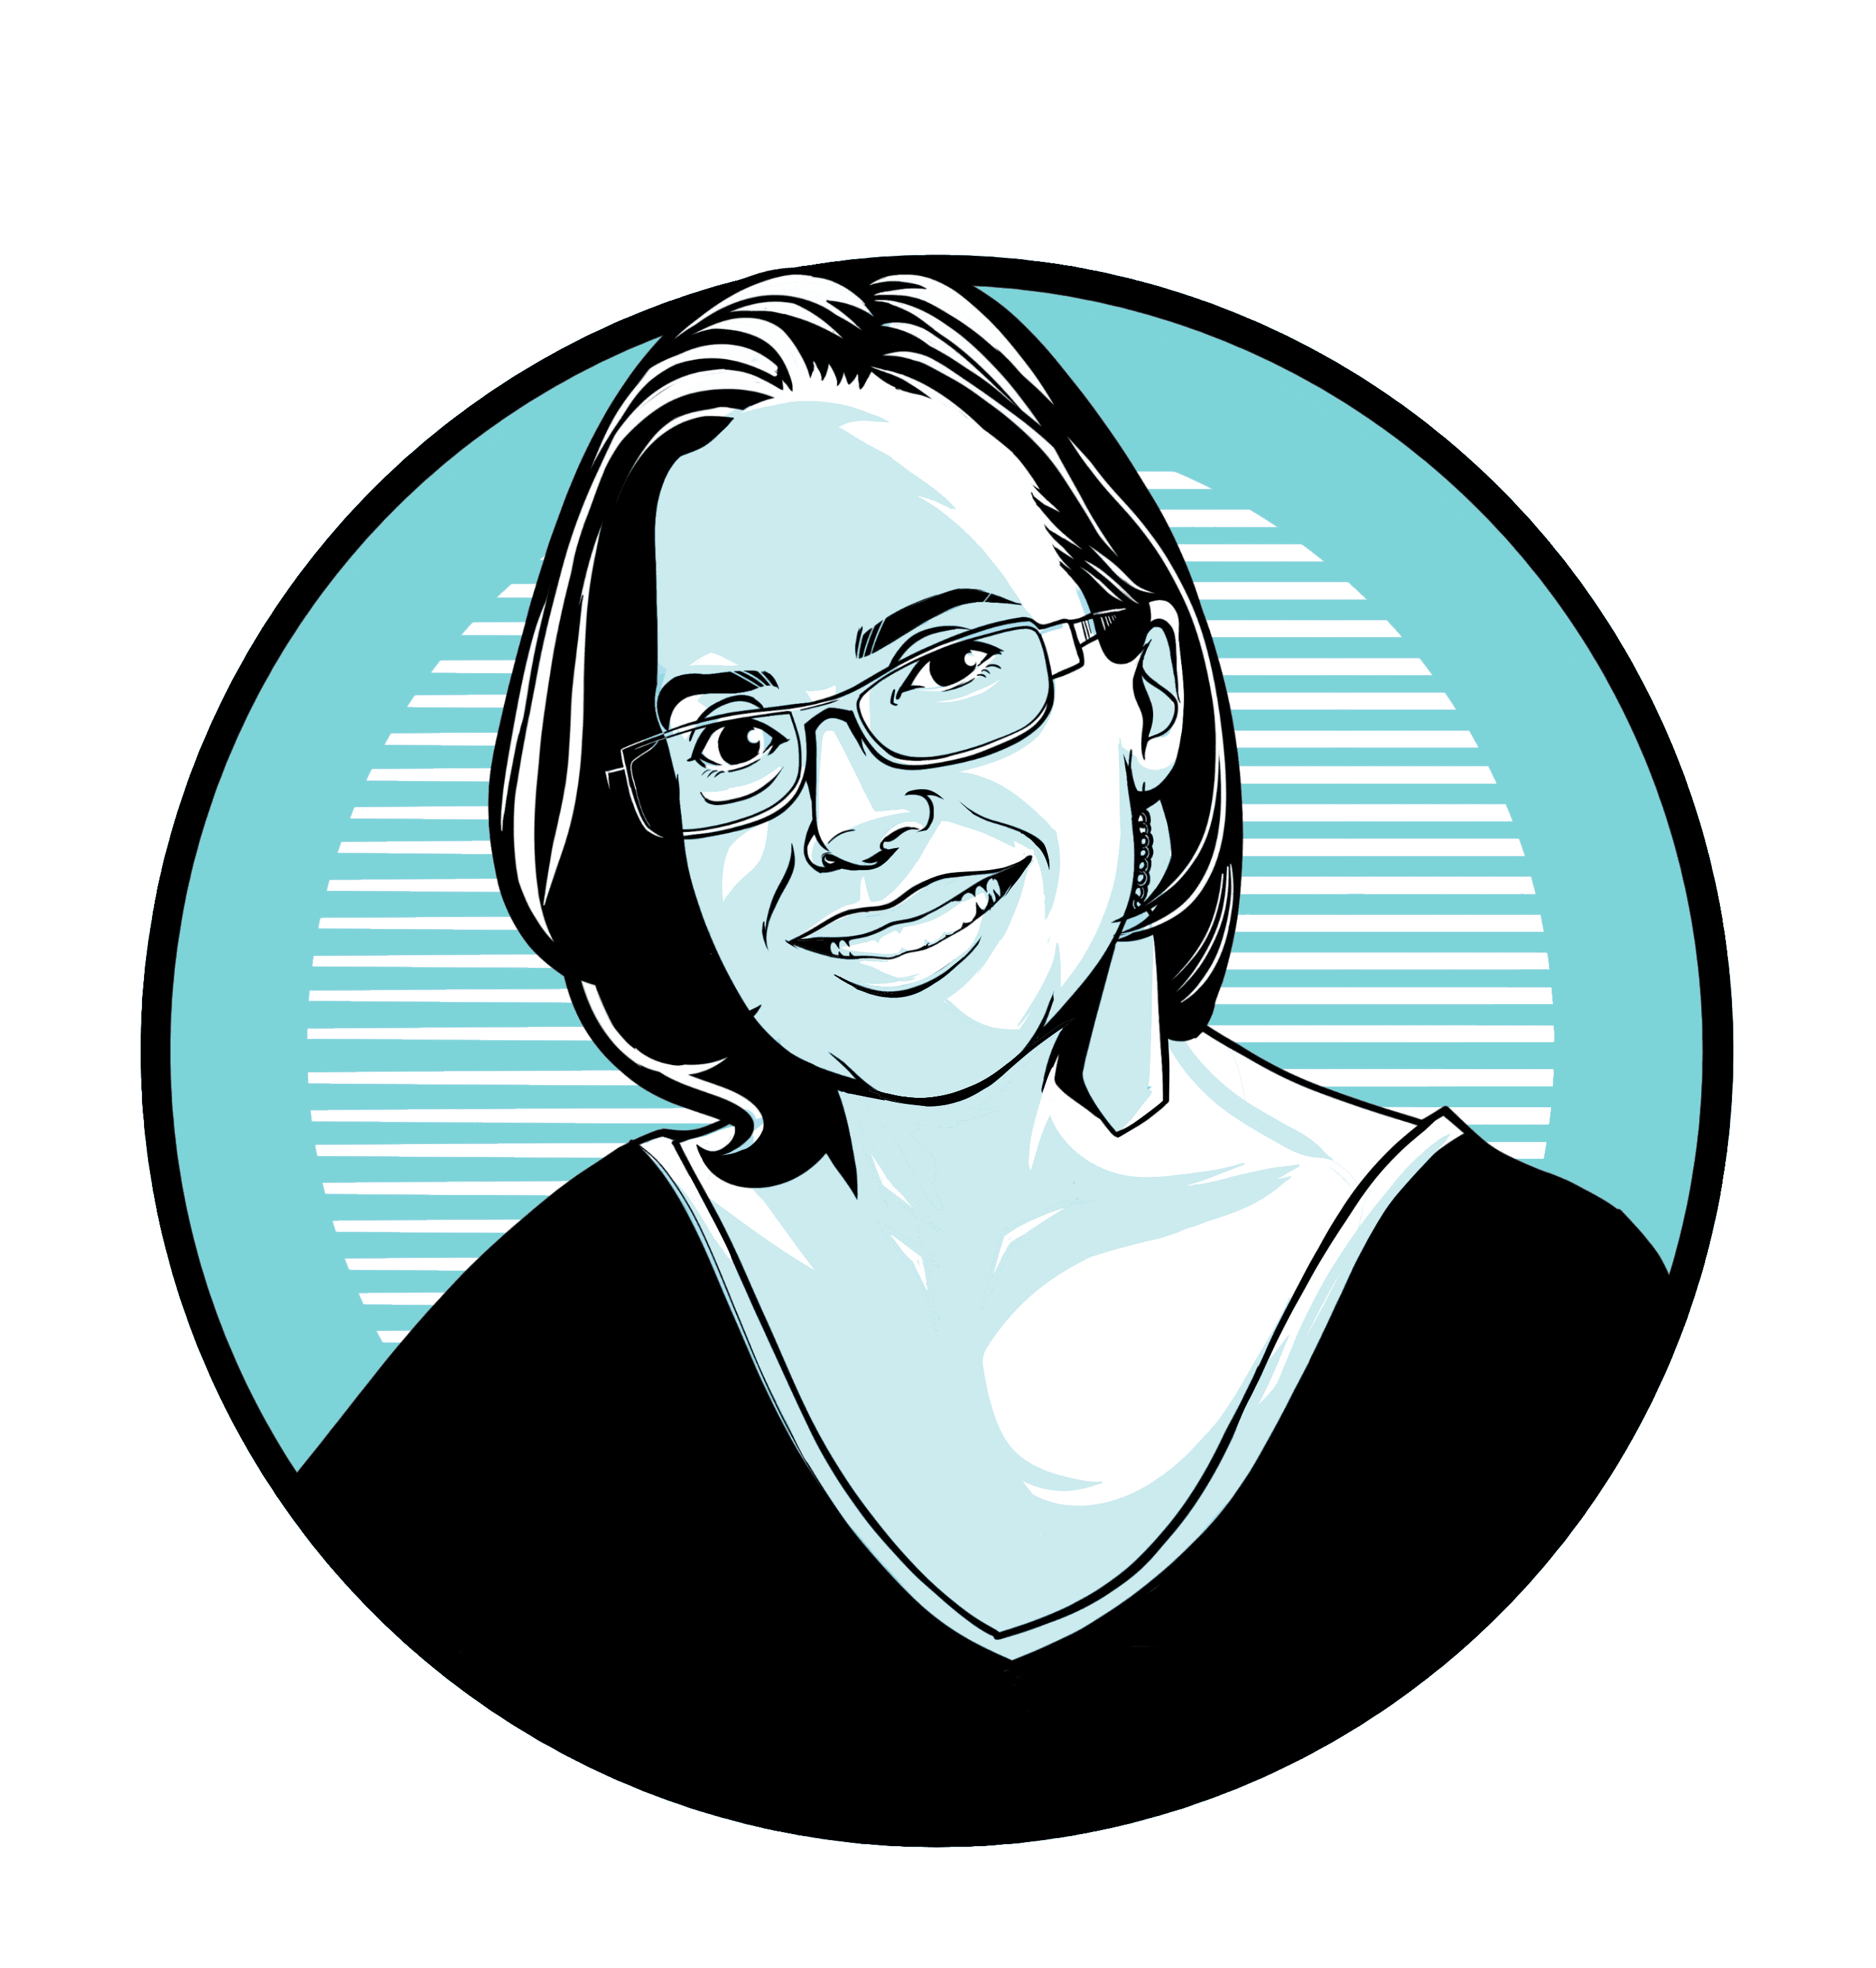 Caricature of Genevieve Martinez-Garcia